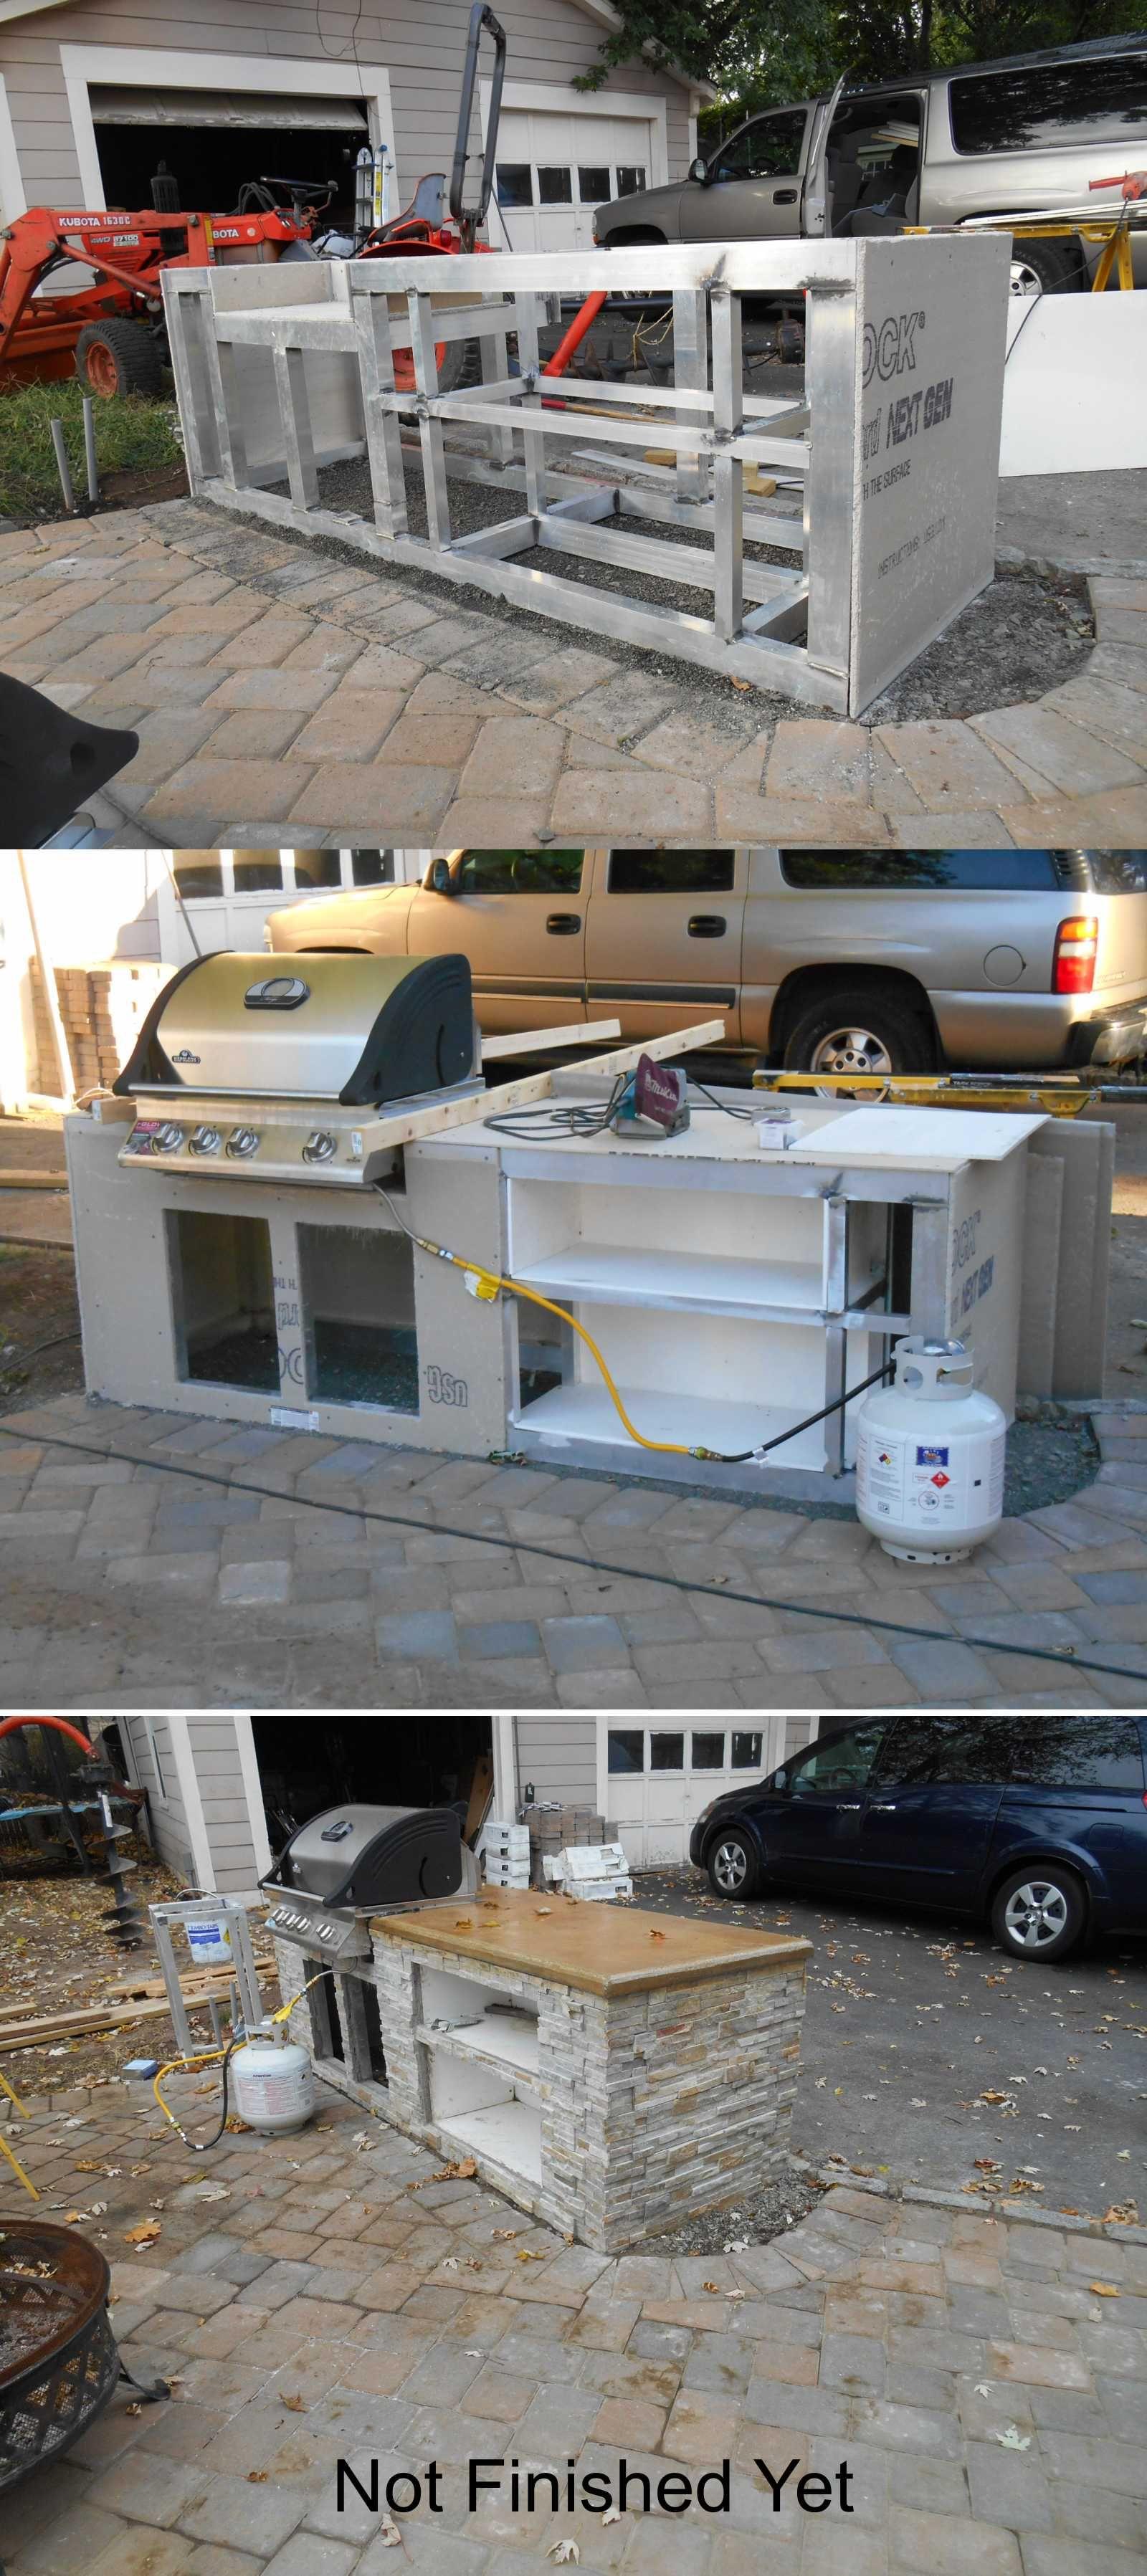 Welded aluminum outdoor kitchen concrete counter top cabañas